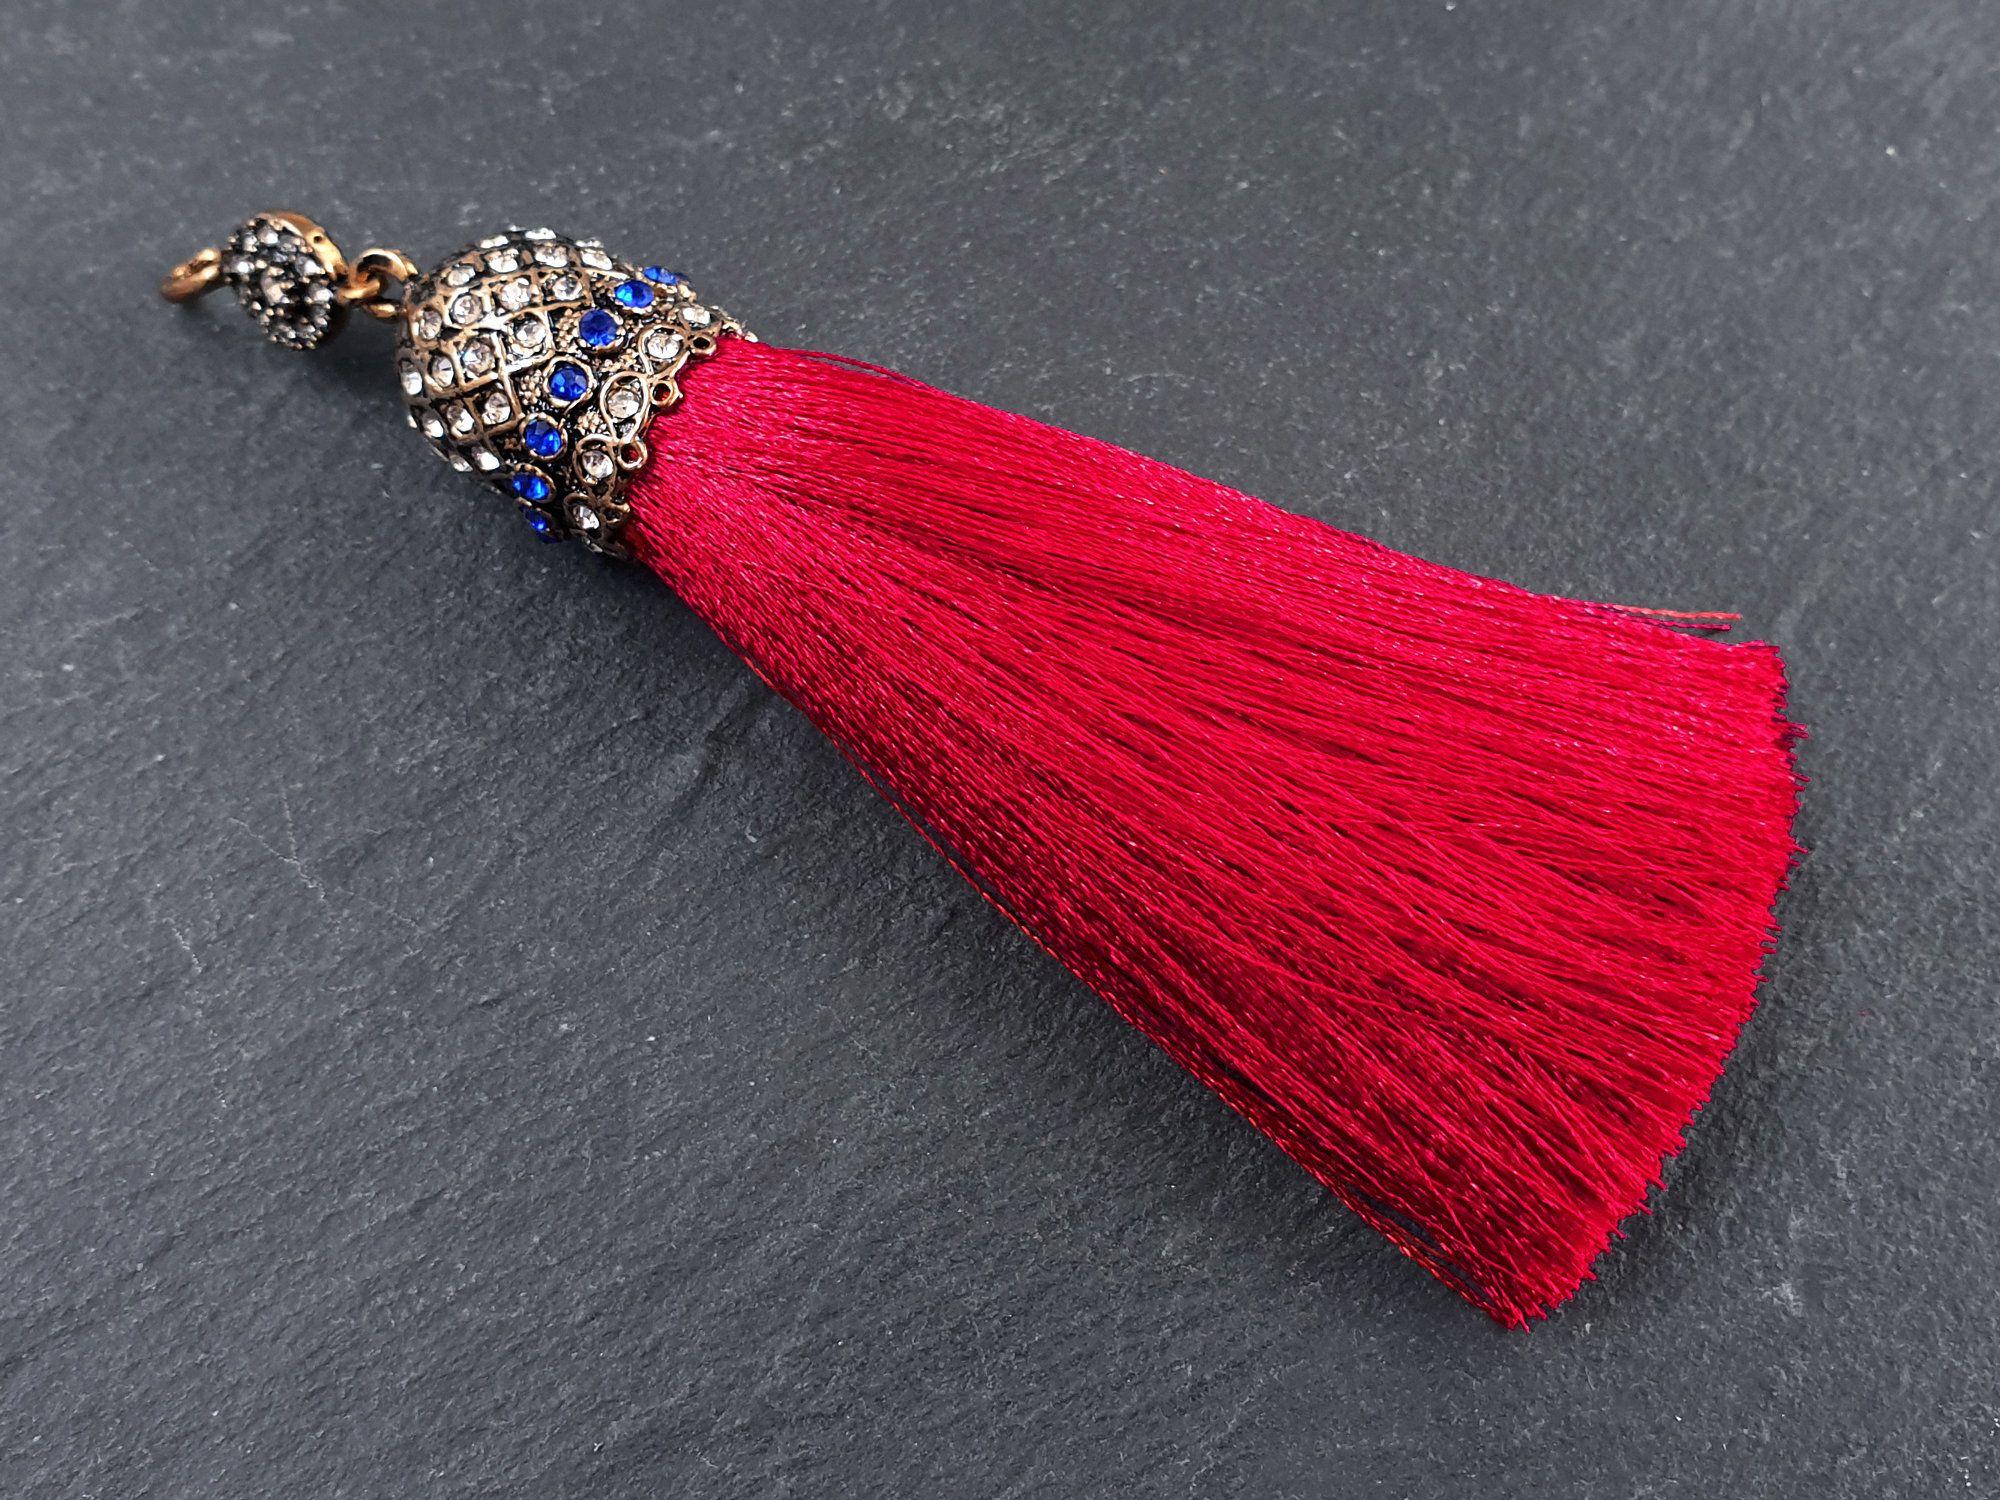 Black silk Tassels Pendant Tassels With Pave Rhinestone Caps DIY necklace Earrings Jewelry tassel Tassel Findings For Jewelry